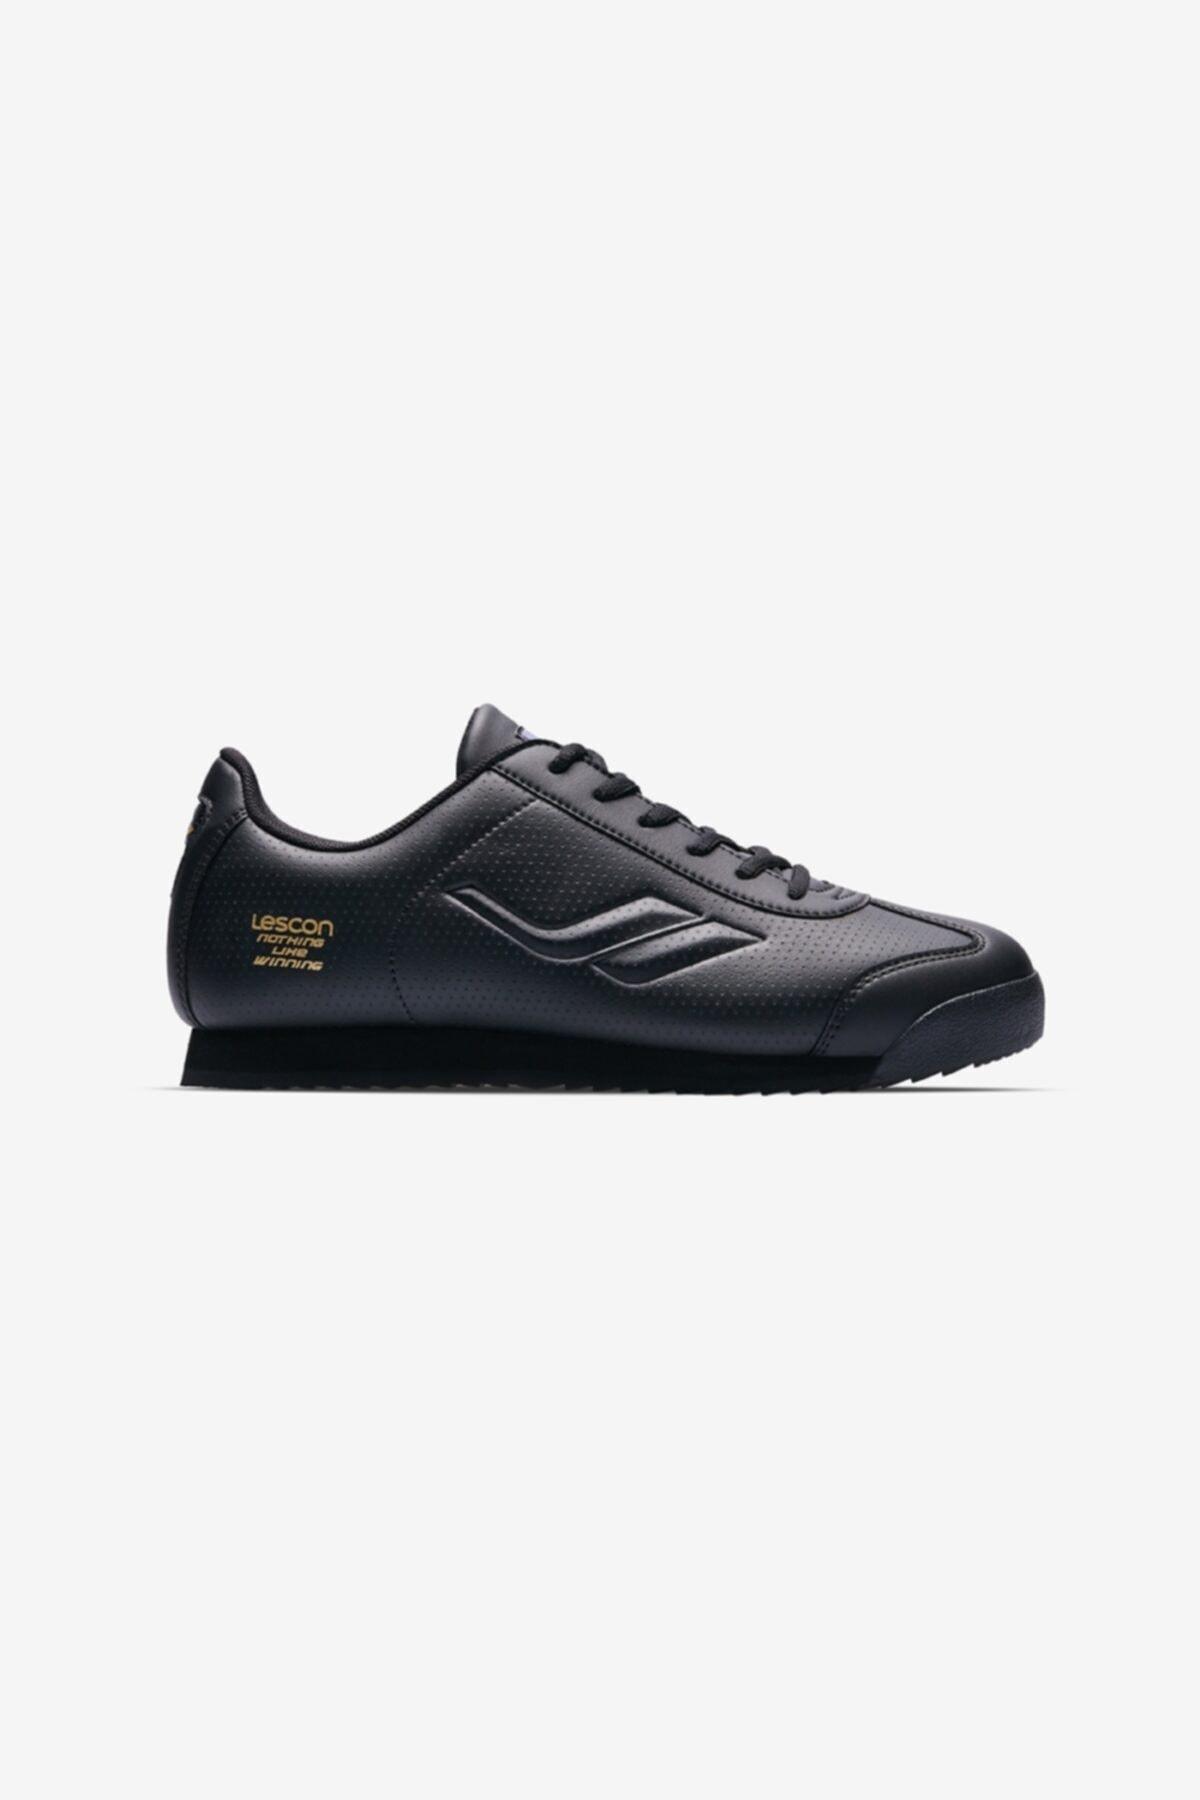 Lescon Winner Bayan Sneaker Ayakkabı Siyah 1